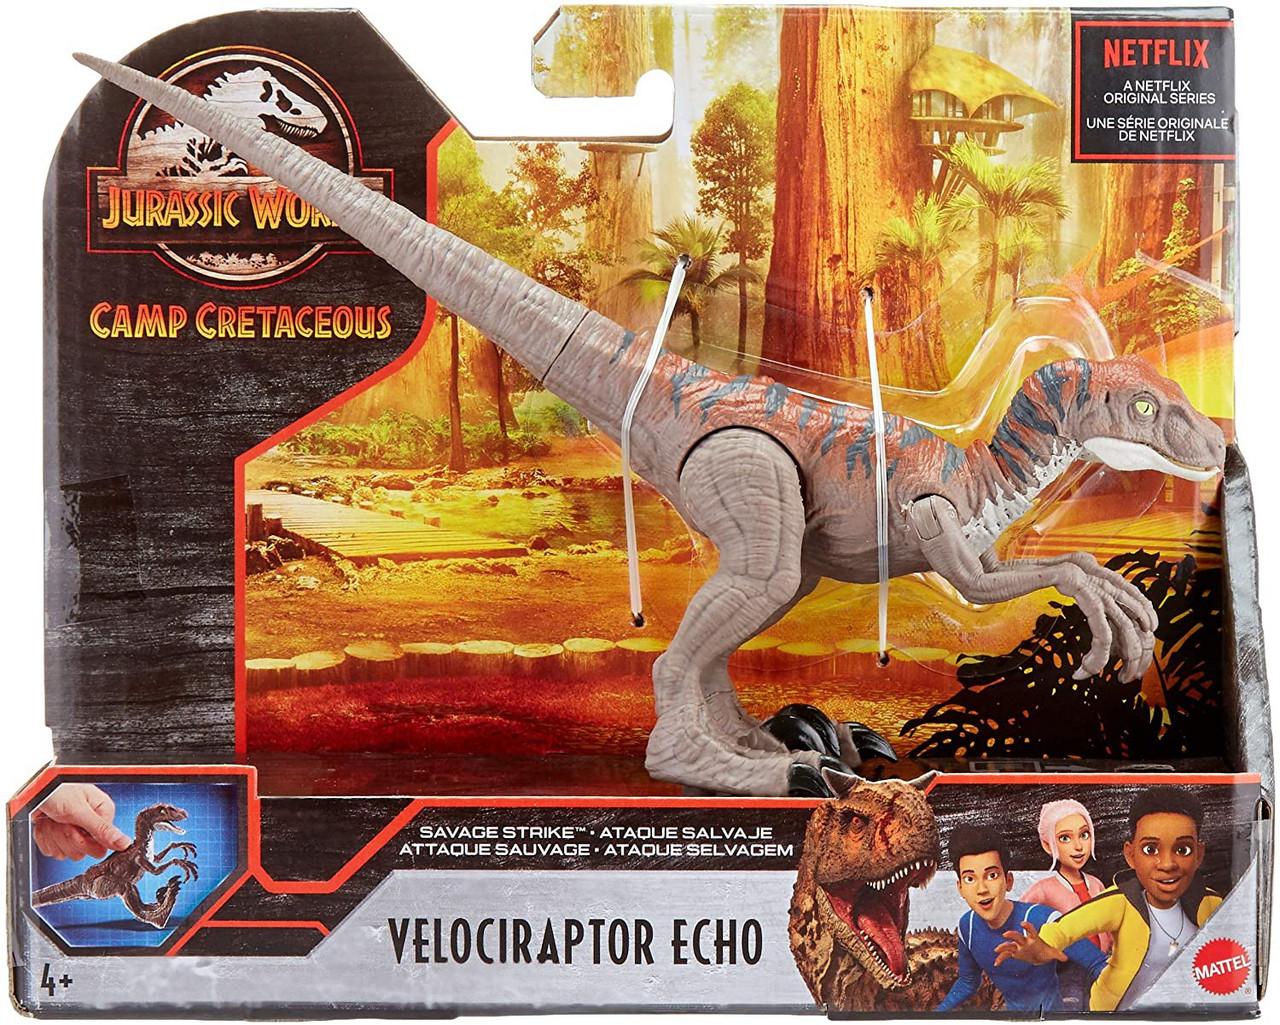 Jurassic World Camp Crétacé Savage Strike Velociraptor Echo Action Figure